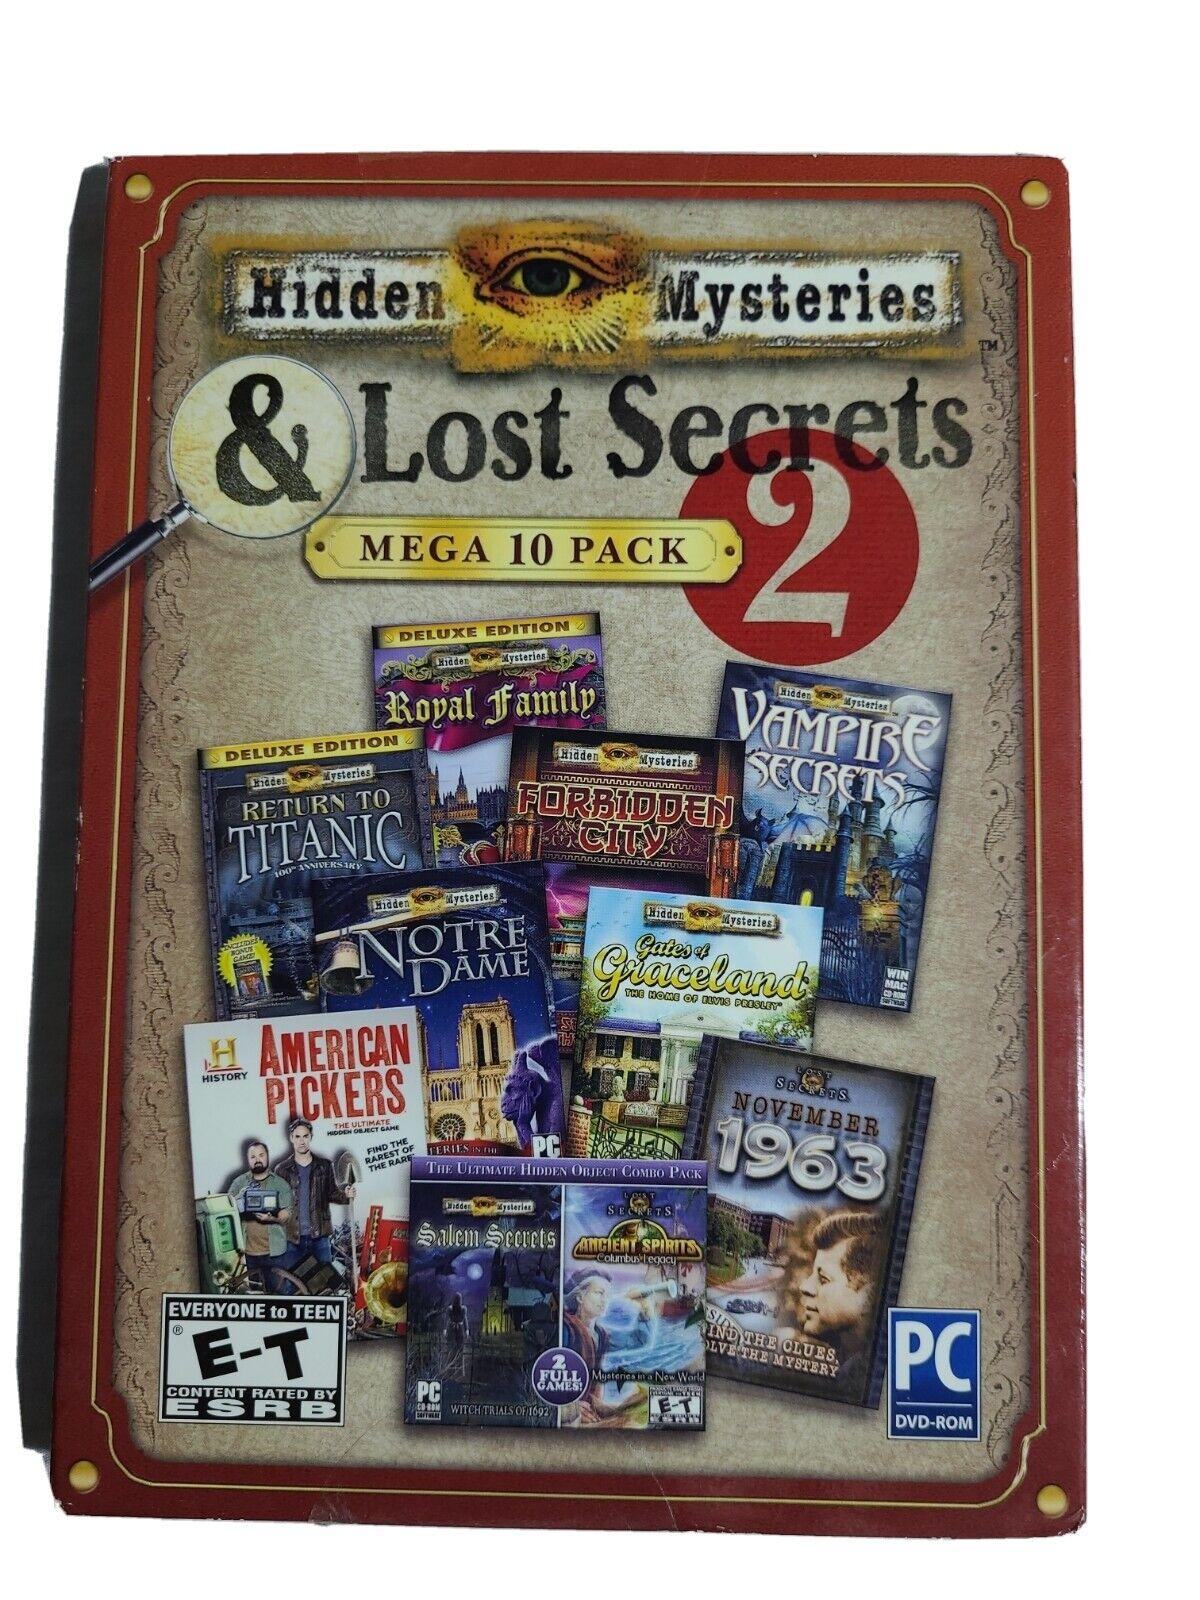 Computer Games - Hidden Mysteries & Lost Secrets Mega 10 Pack PC Games Windows 10 8 7 XP Computer